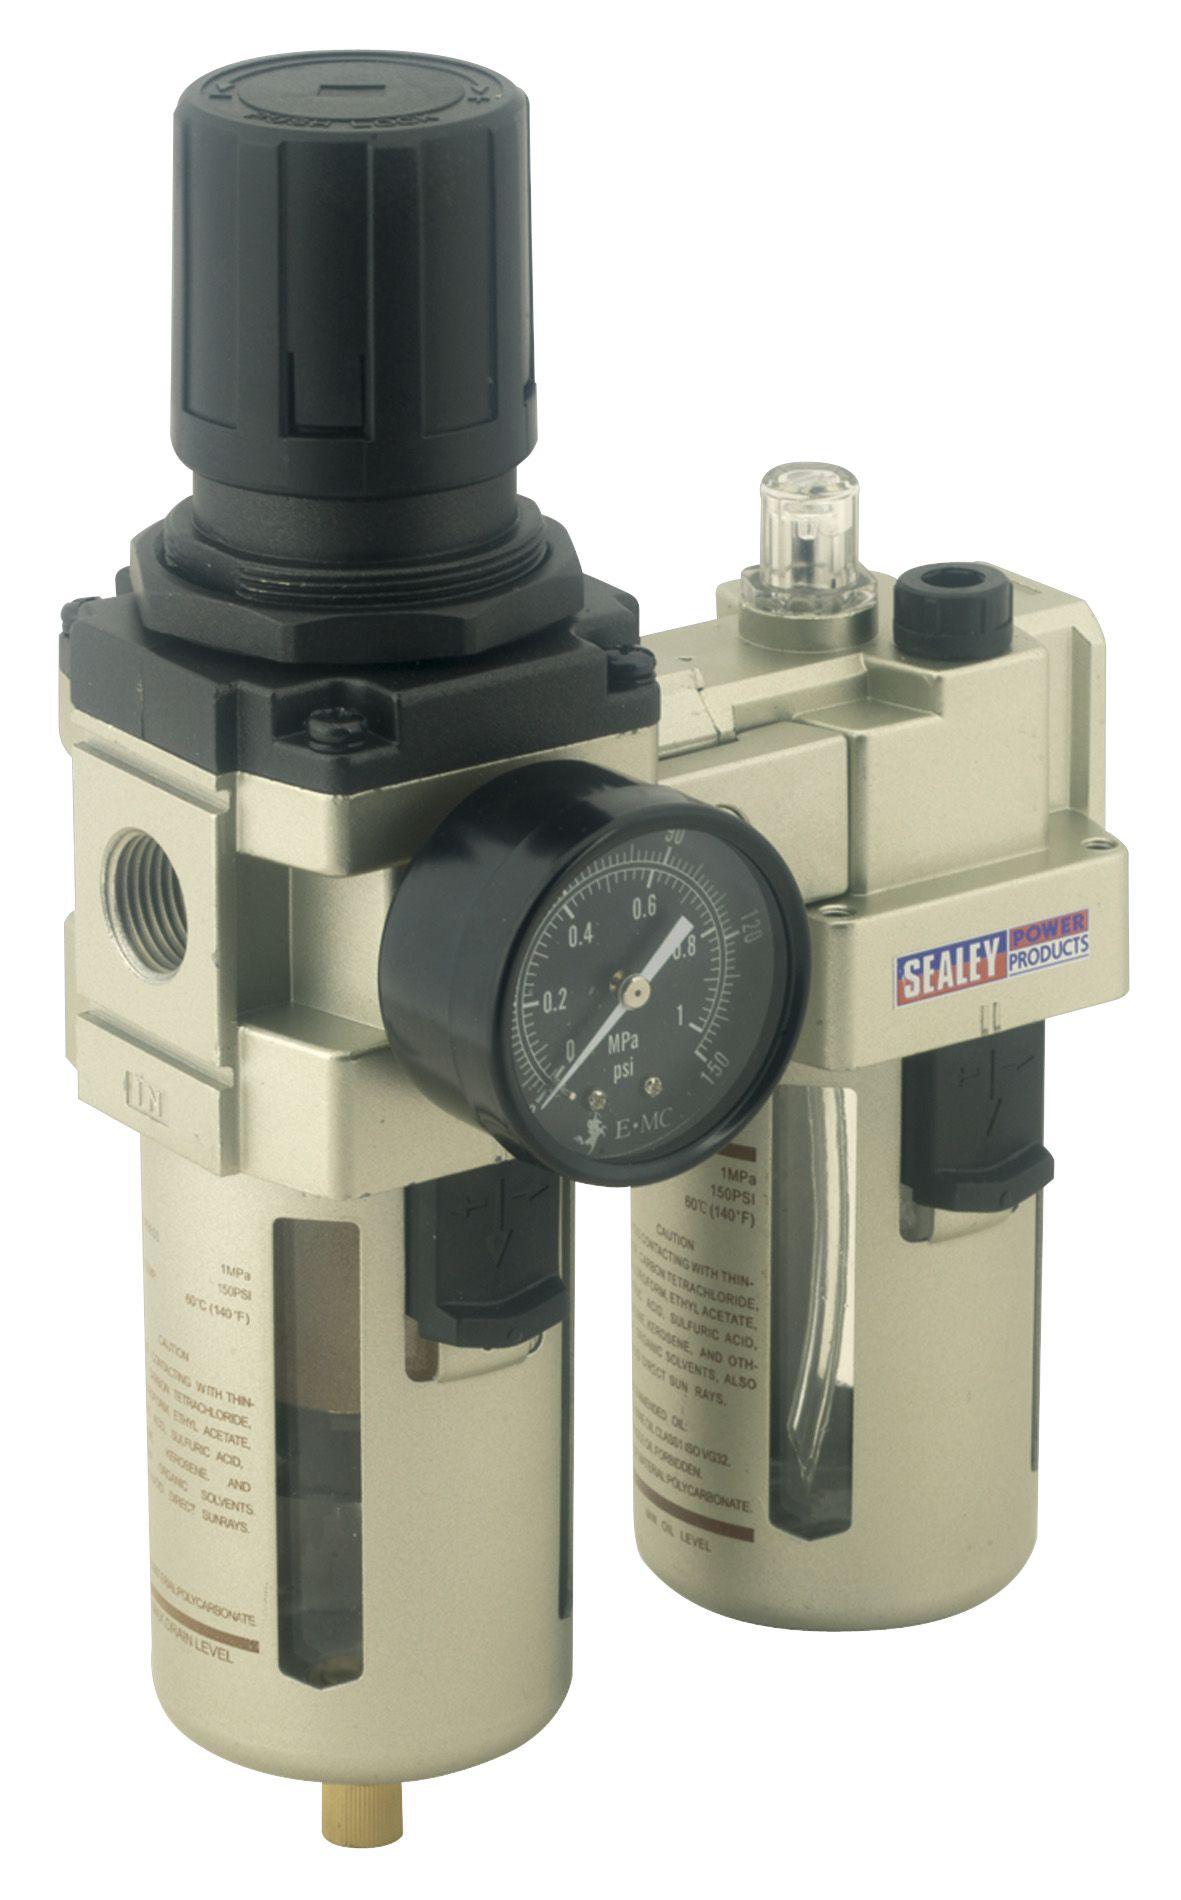 Sealey Air Filter/Regulator/Lubricator Max Airflow 105cfm